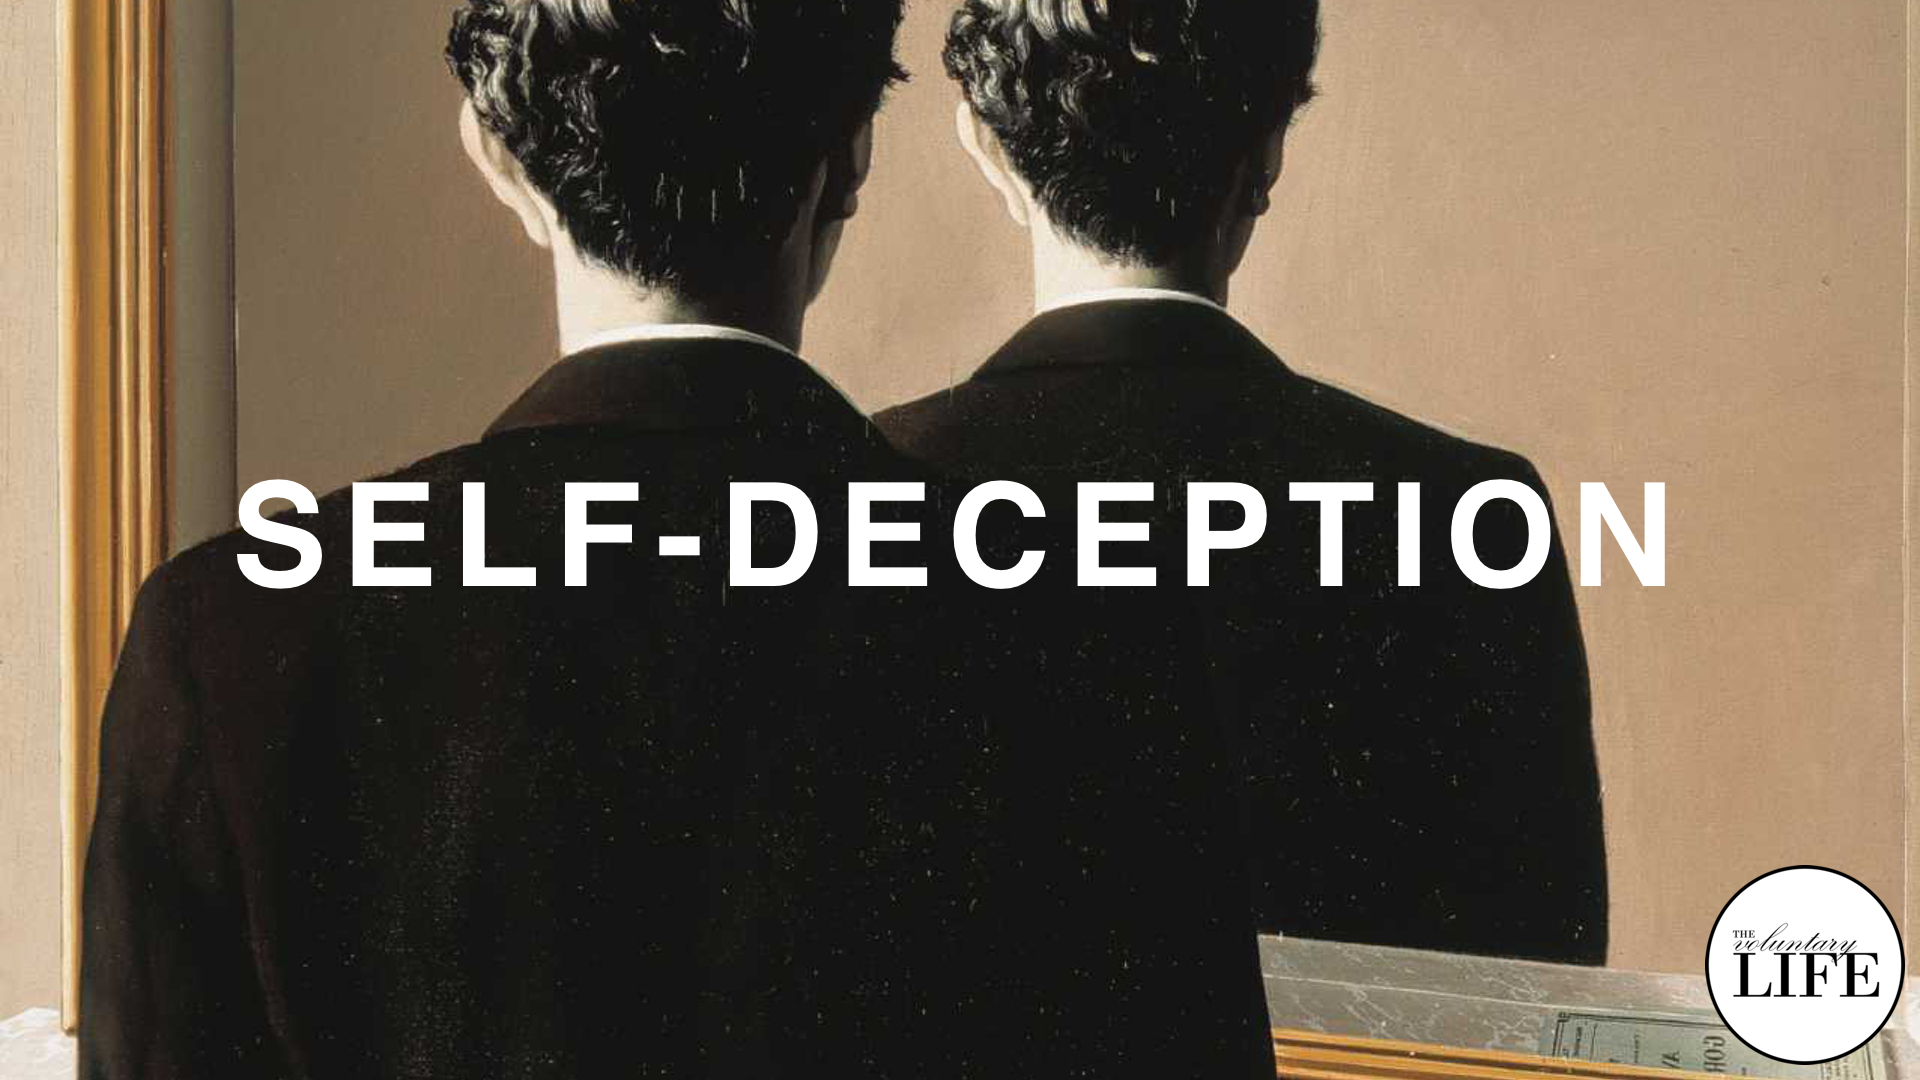 202 Self-Deception